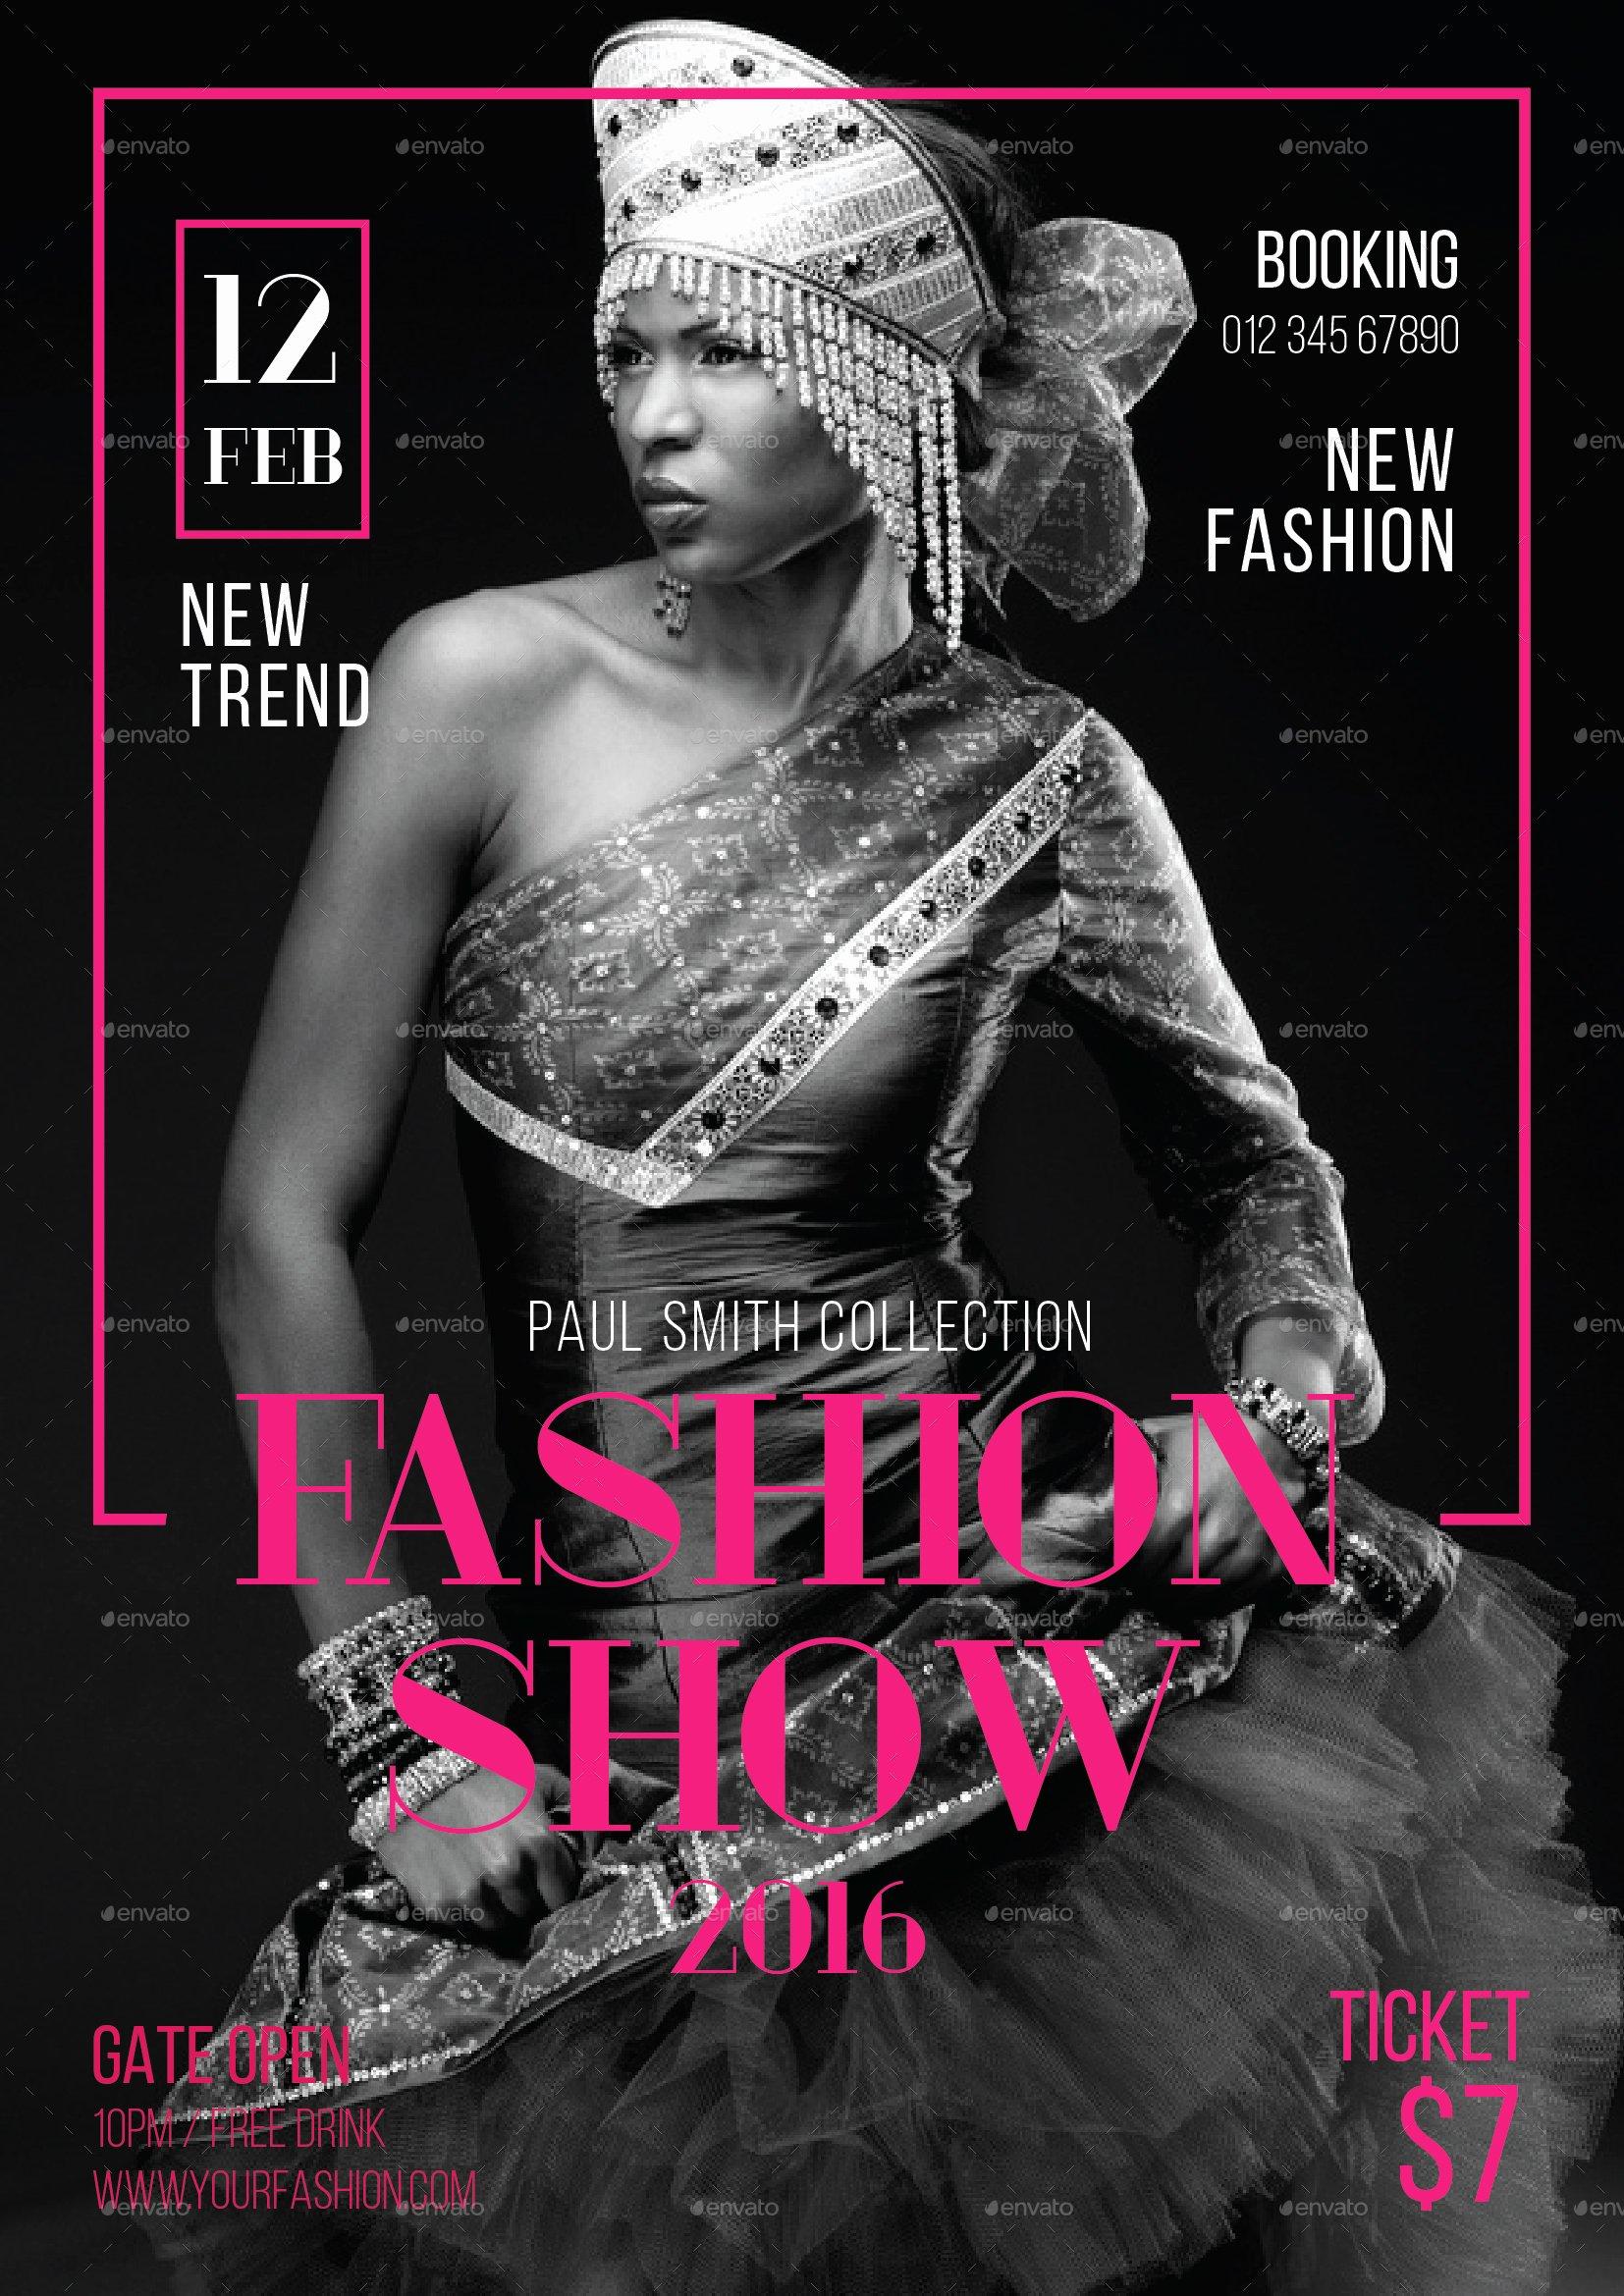 Fashion Show Flyer Template Free Luxury Fashion Show Flyer by tokosatsu